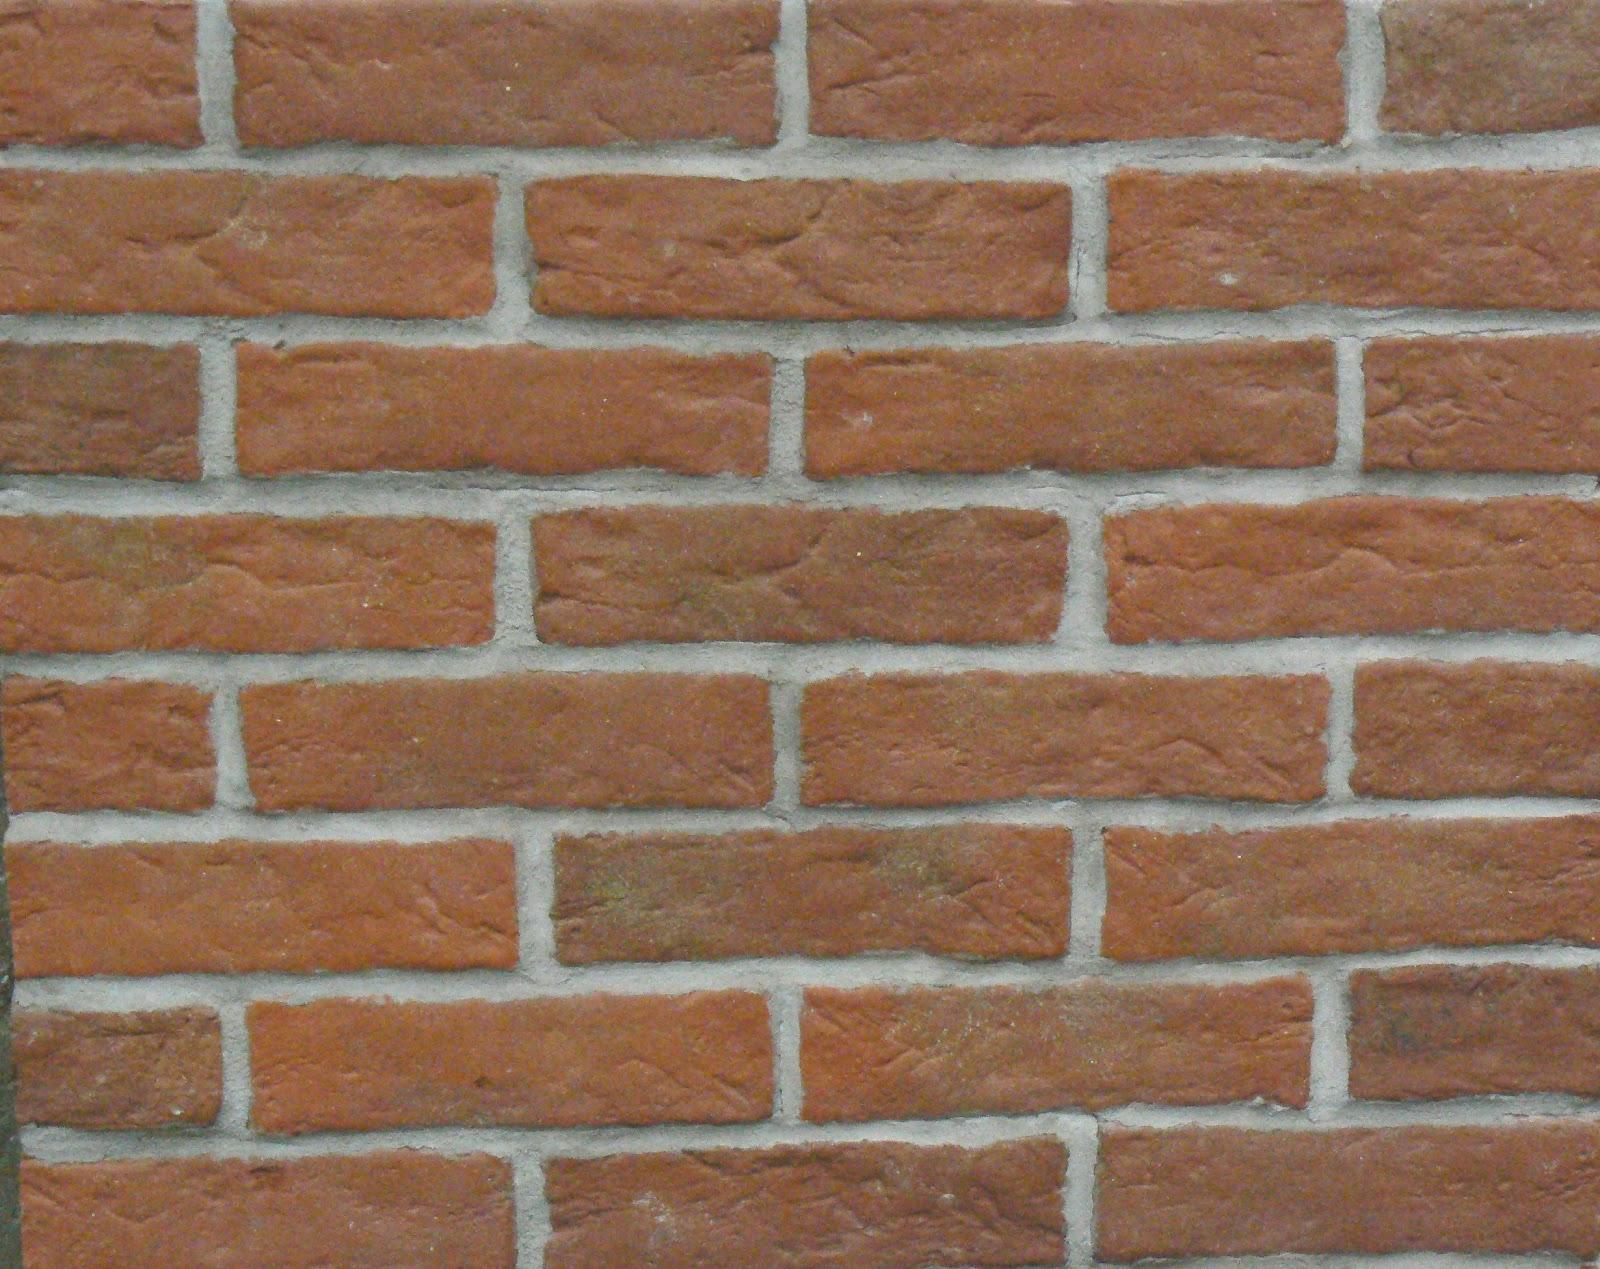 Brick Driveway Image Effect Tiles